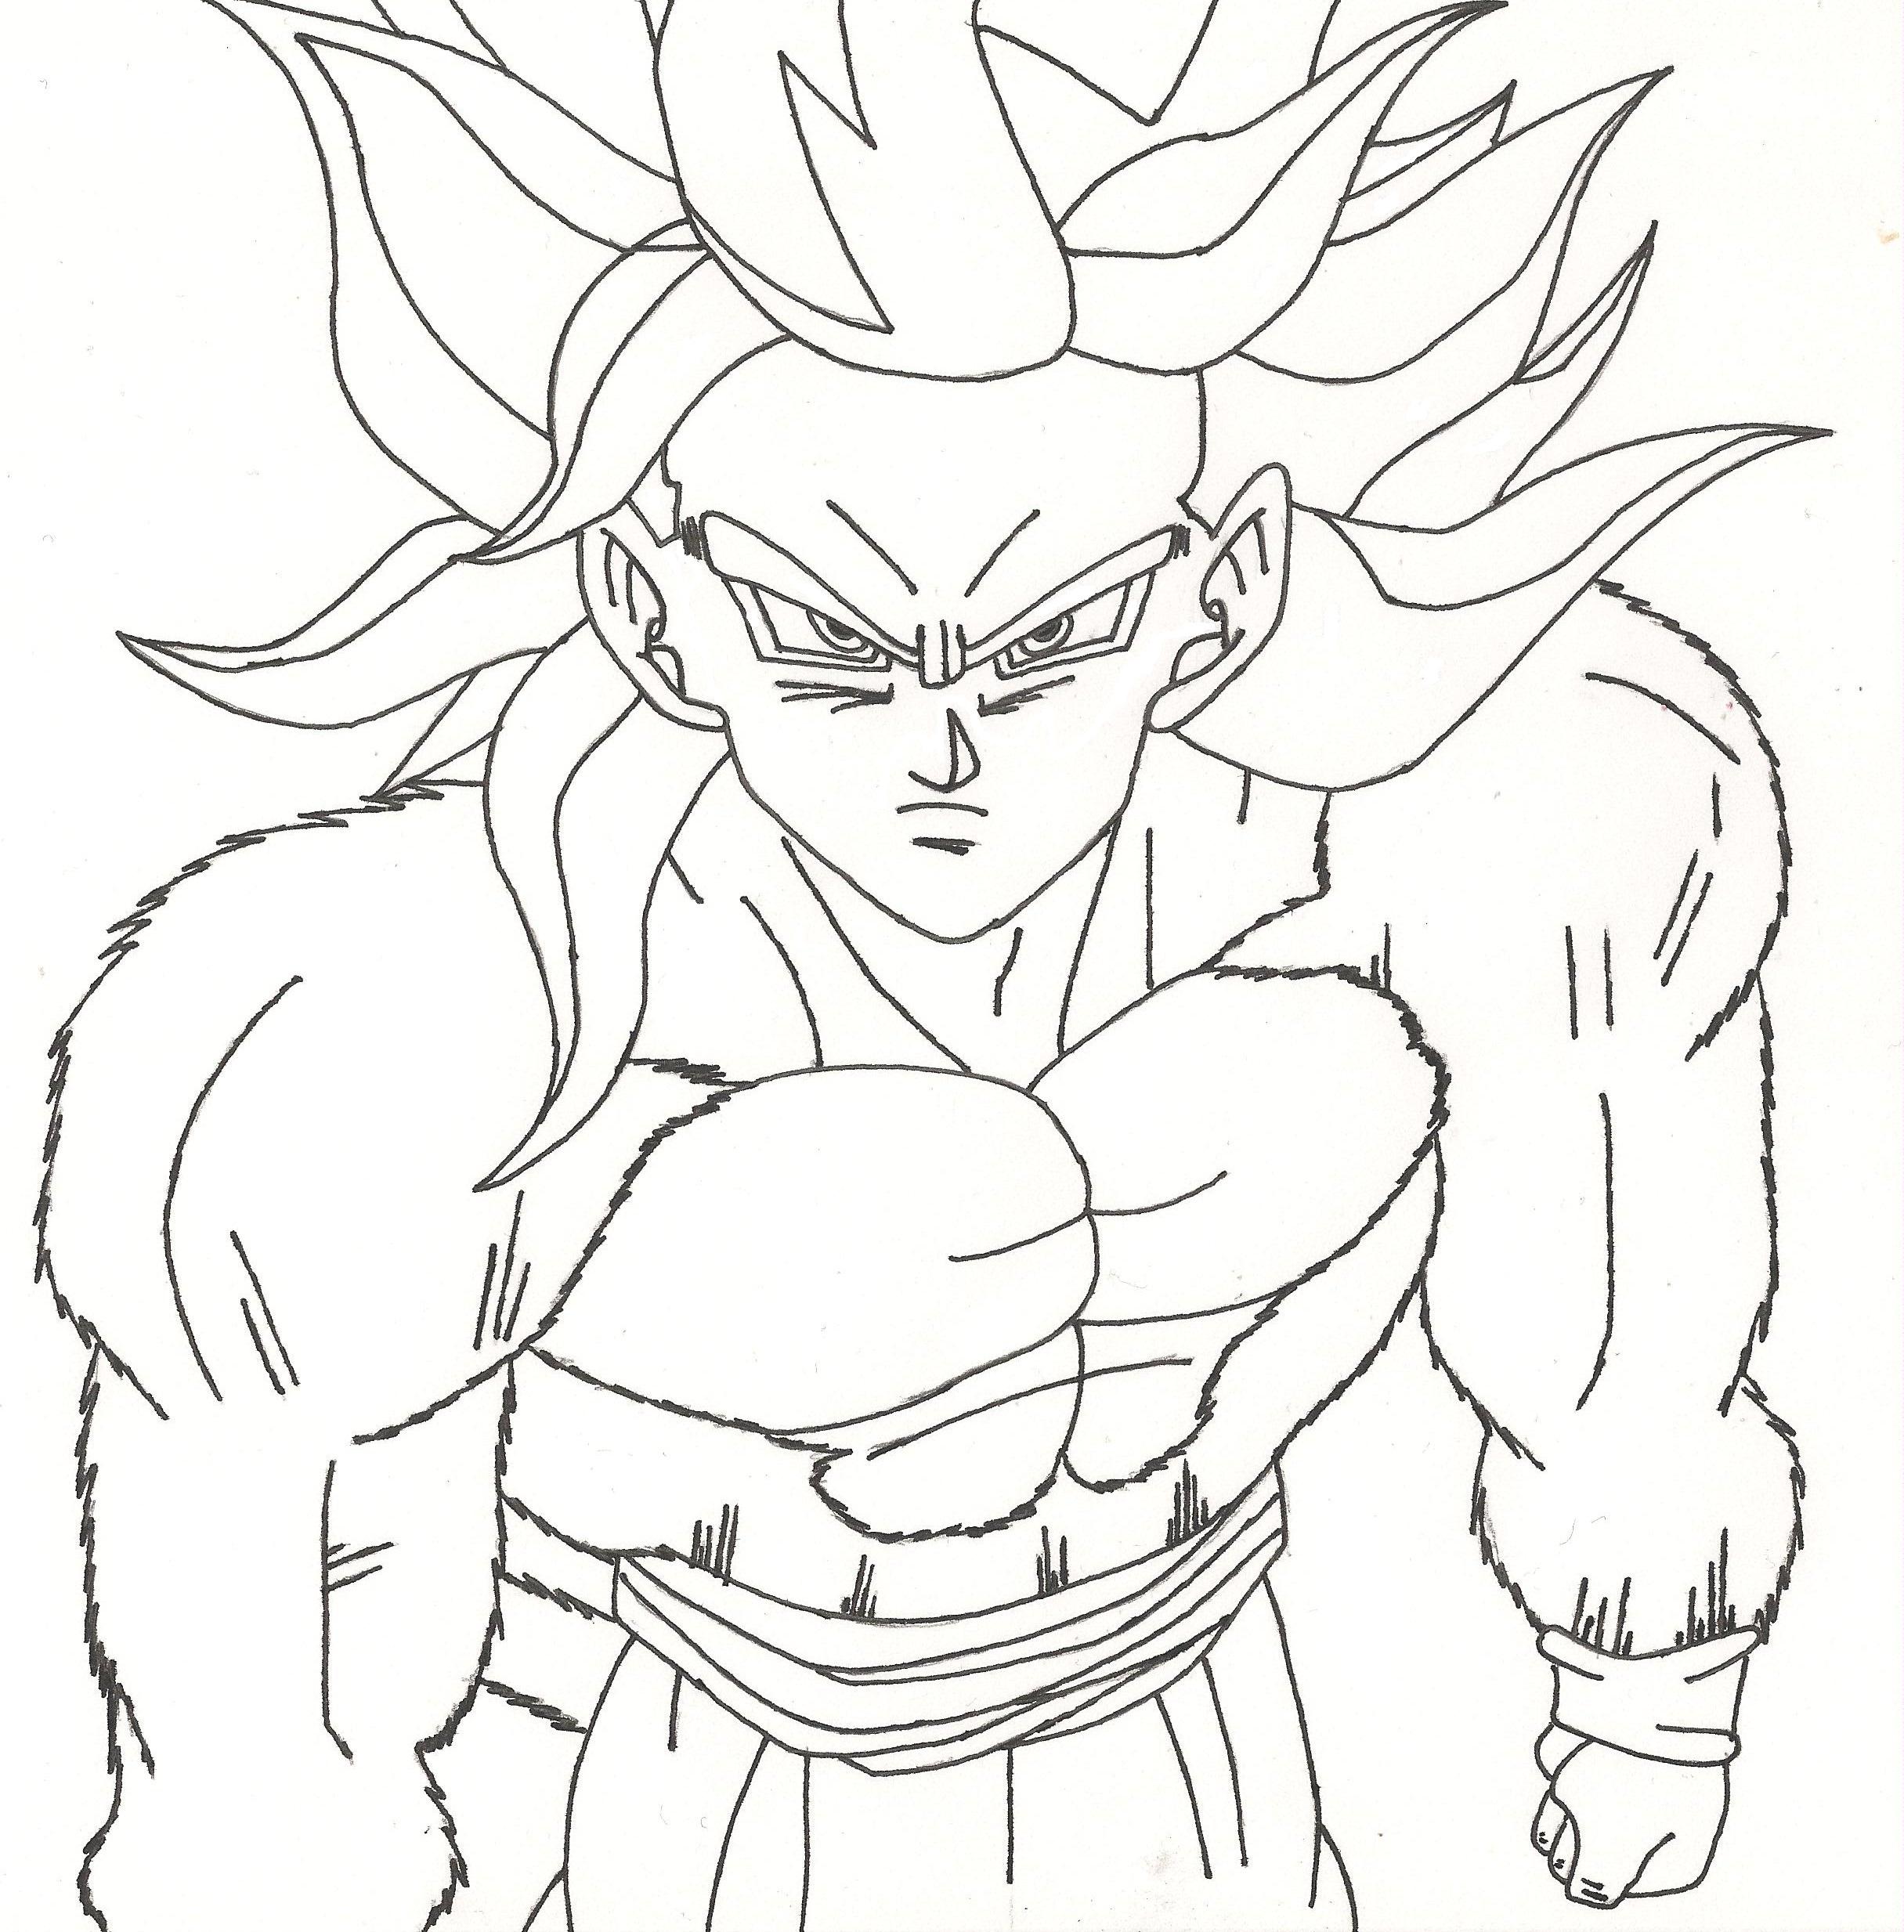 2431x2467 Dragon Ball Z Coloring Pages Super Saiyan For Photos Of Goku